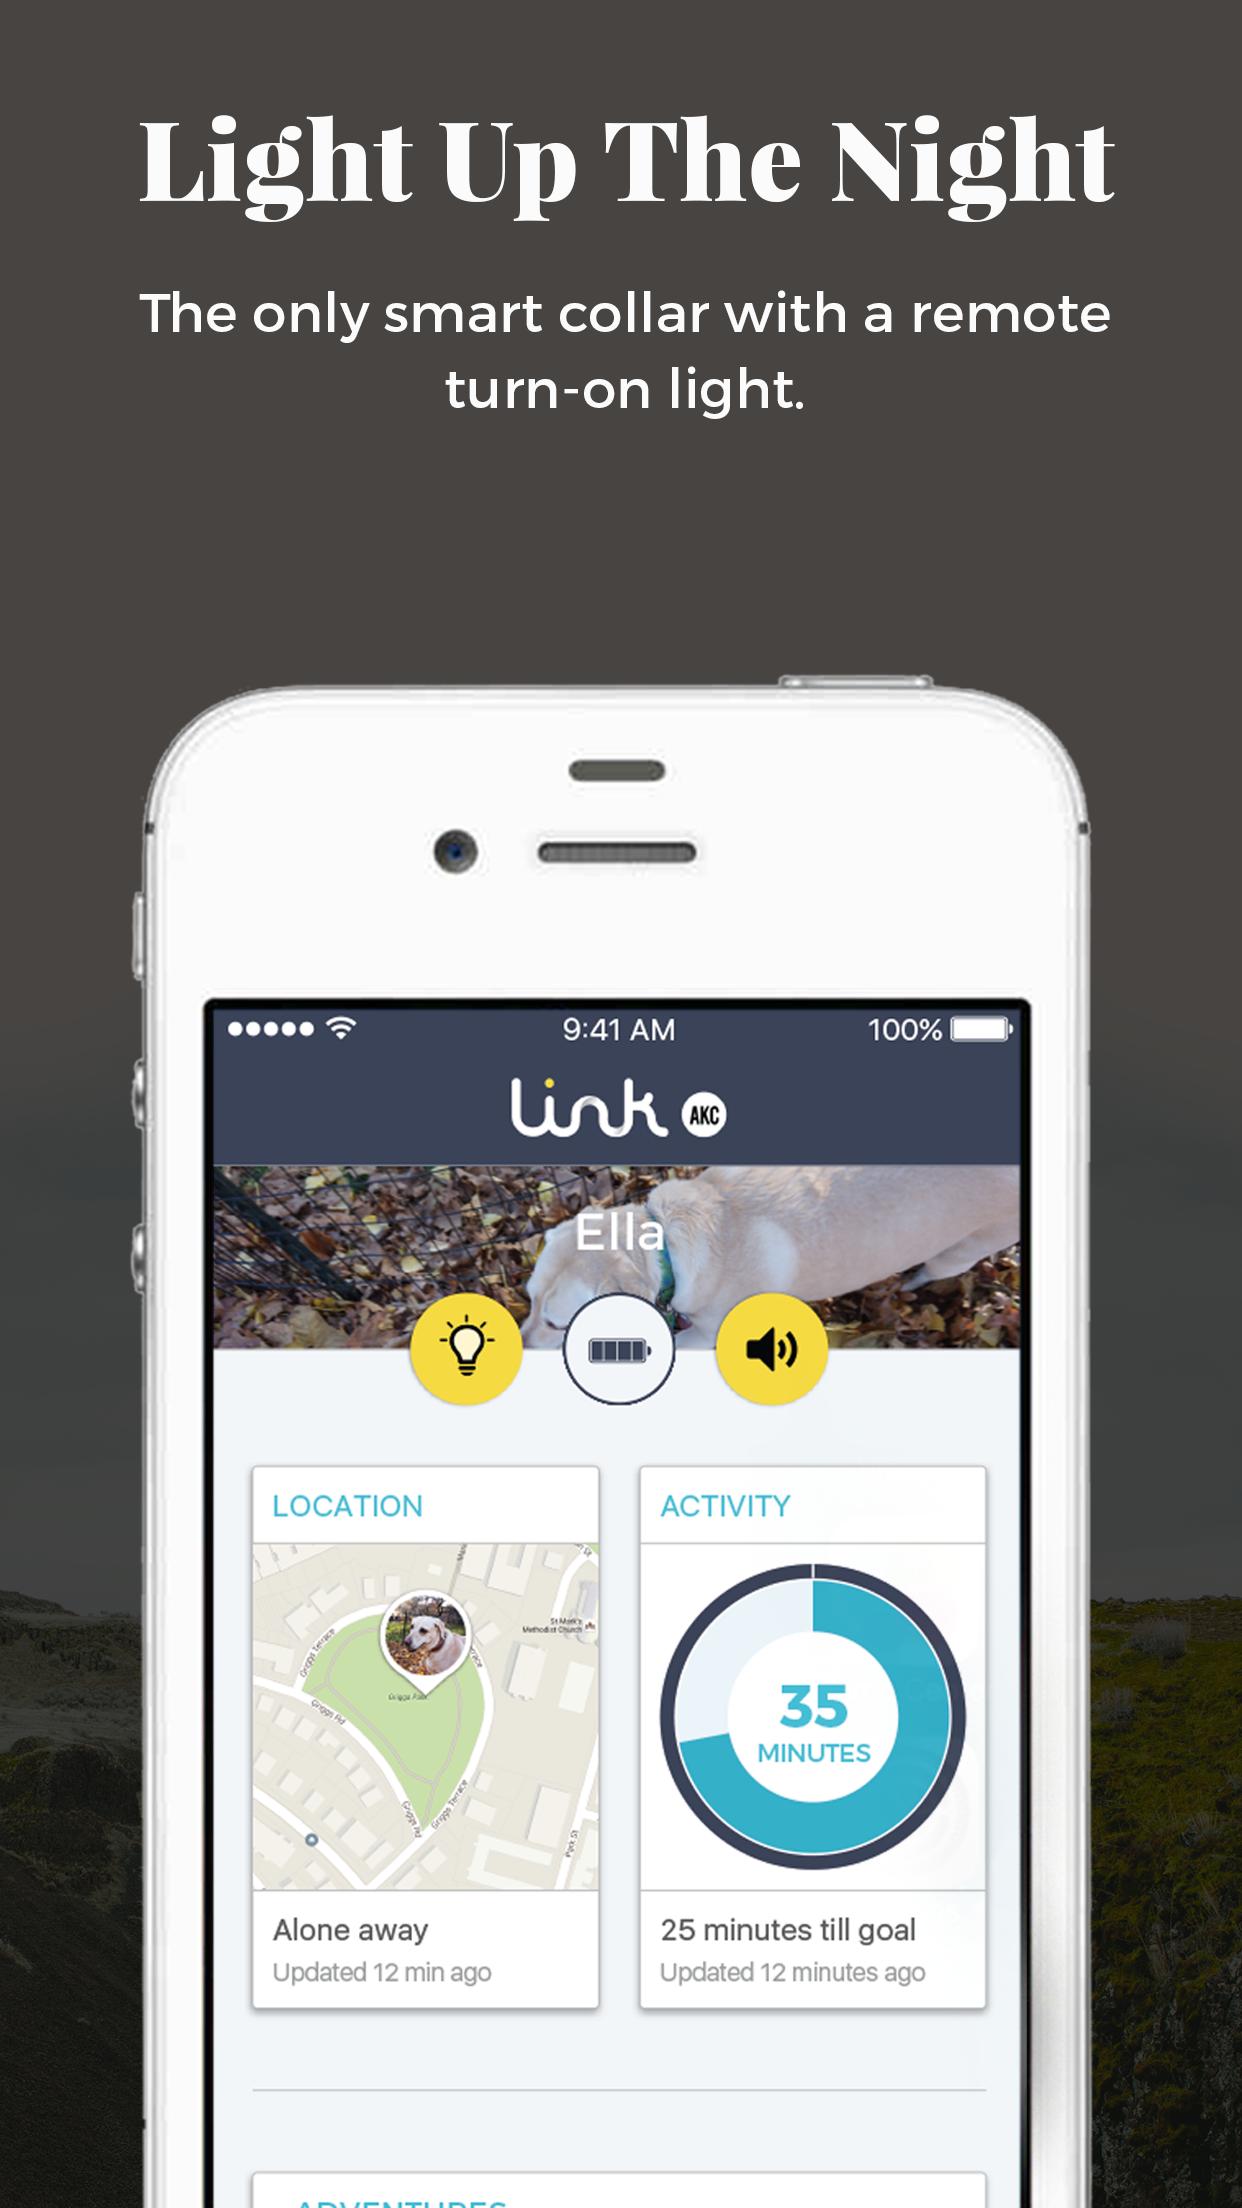 LINK AKC Screenshot